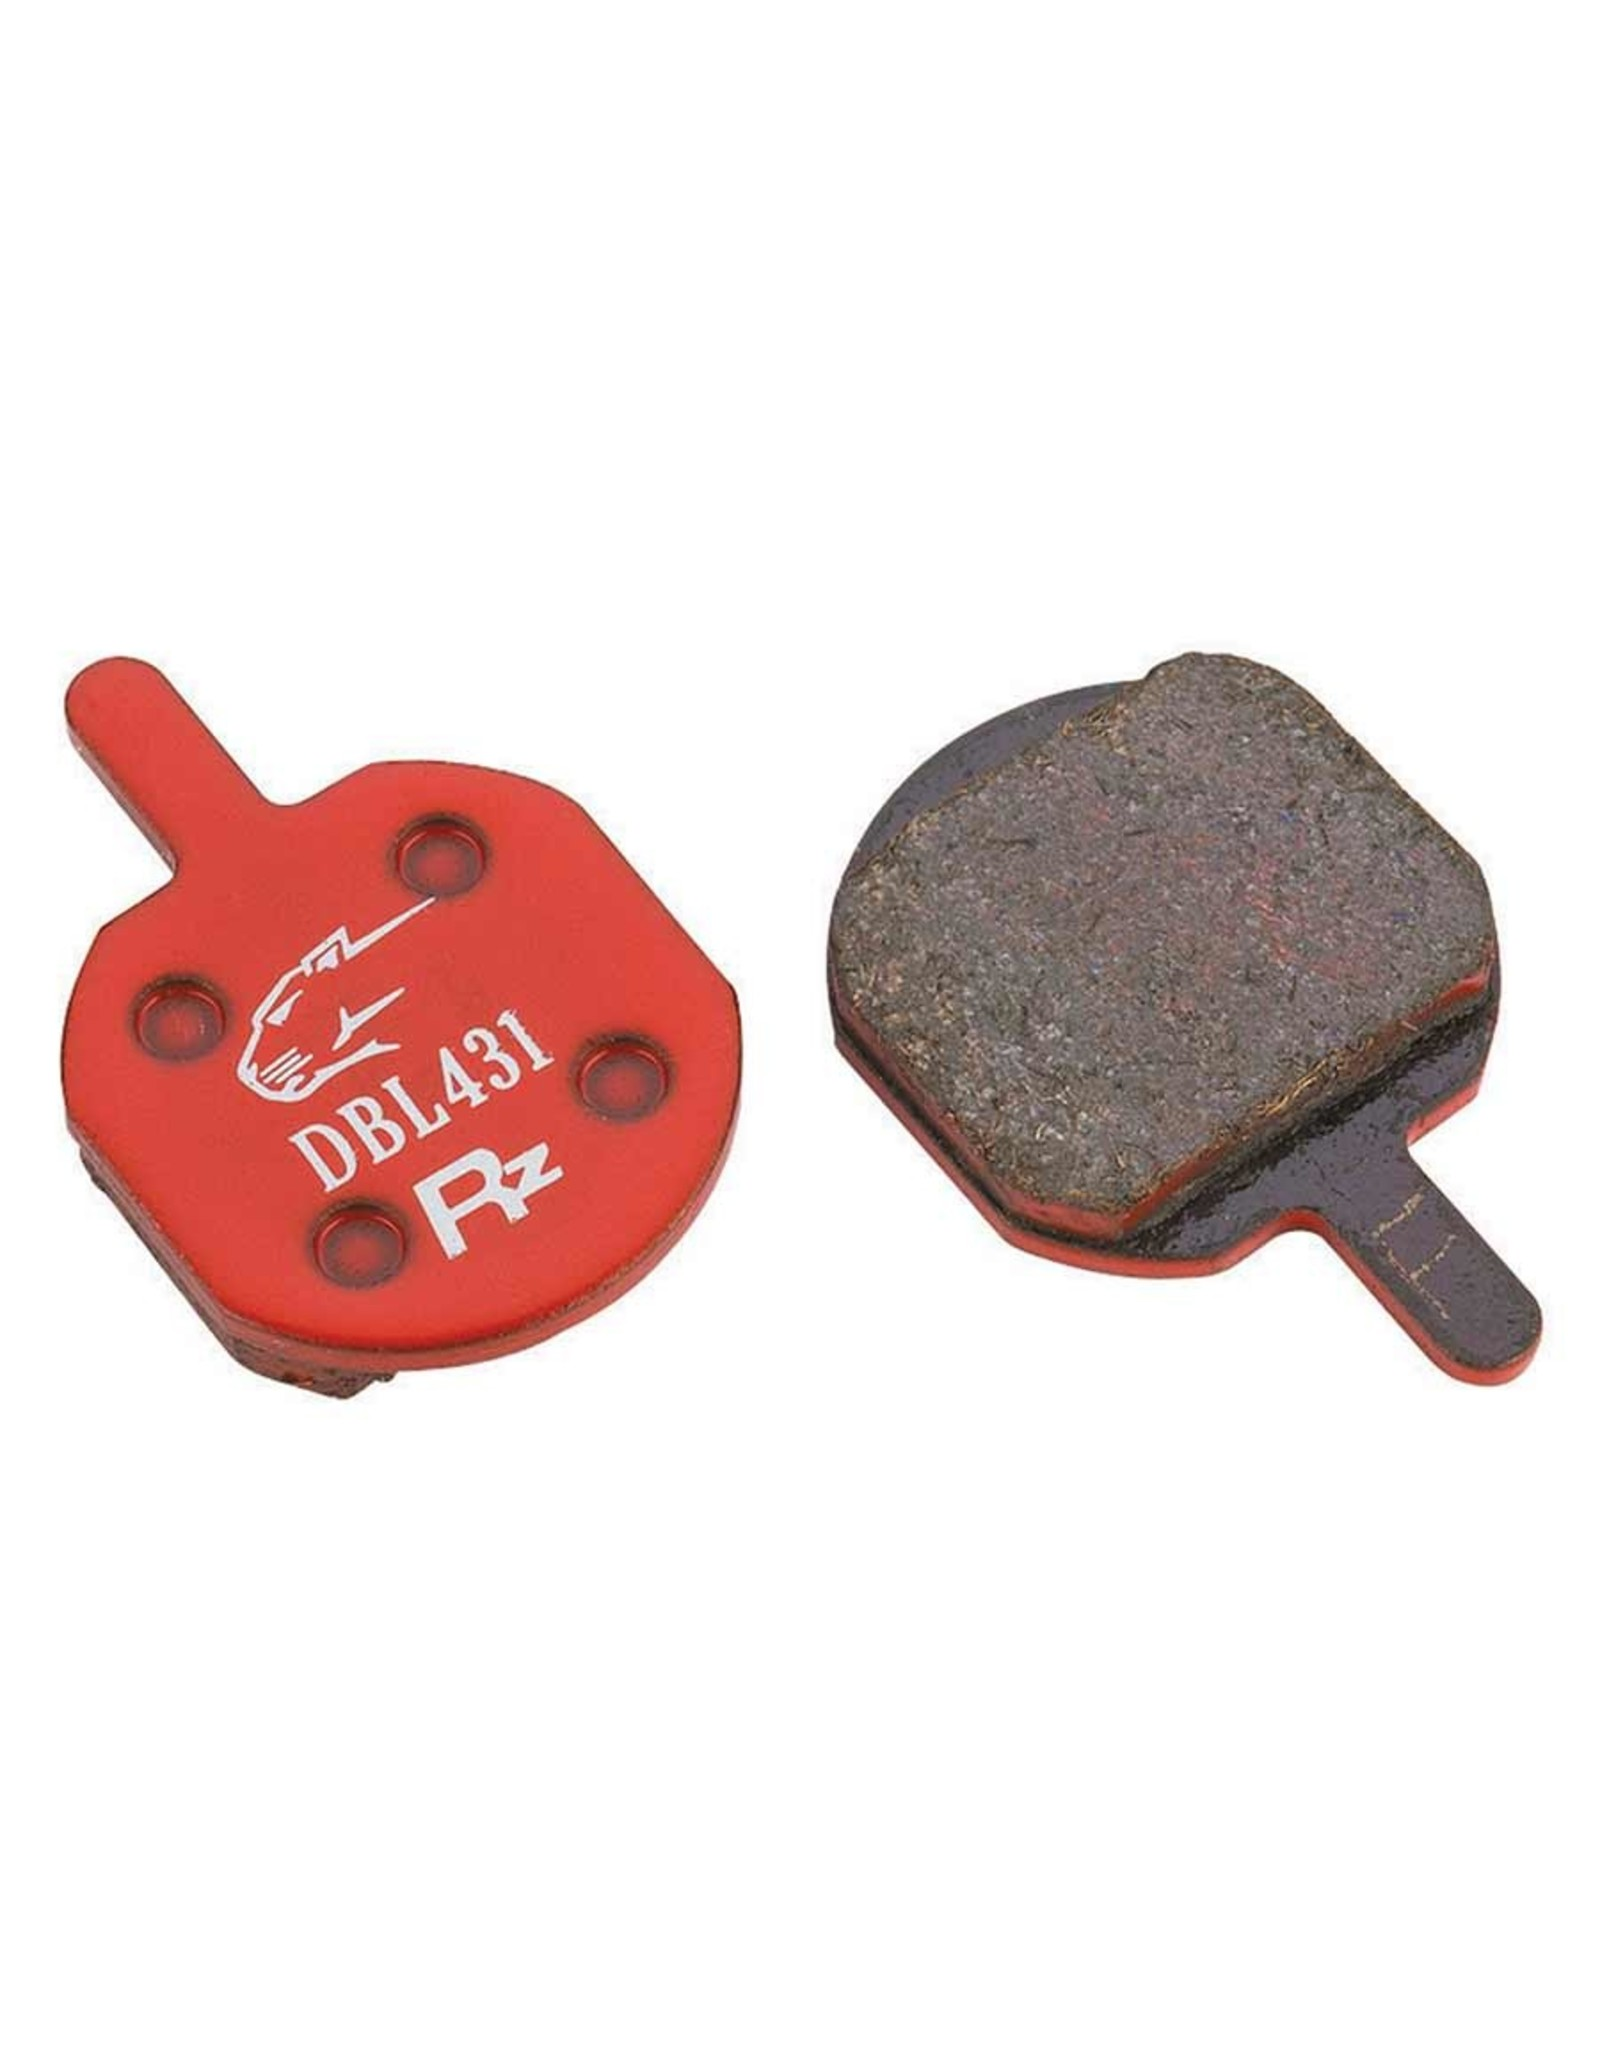 Mountain Sport, Disc brake pads, Semi-metallic, Hayes CX5, MX5, MX4, MX3, MX2, Sole